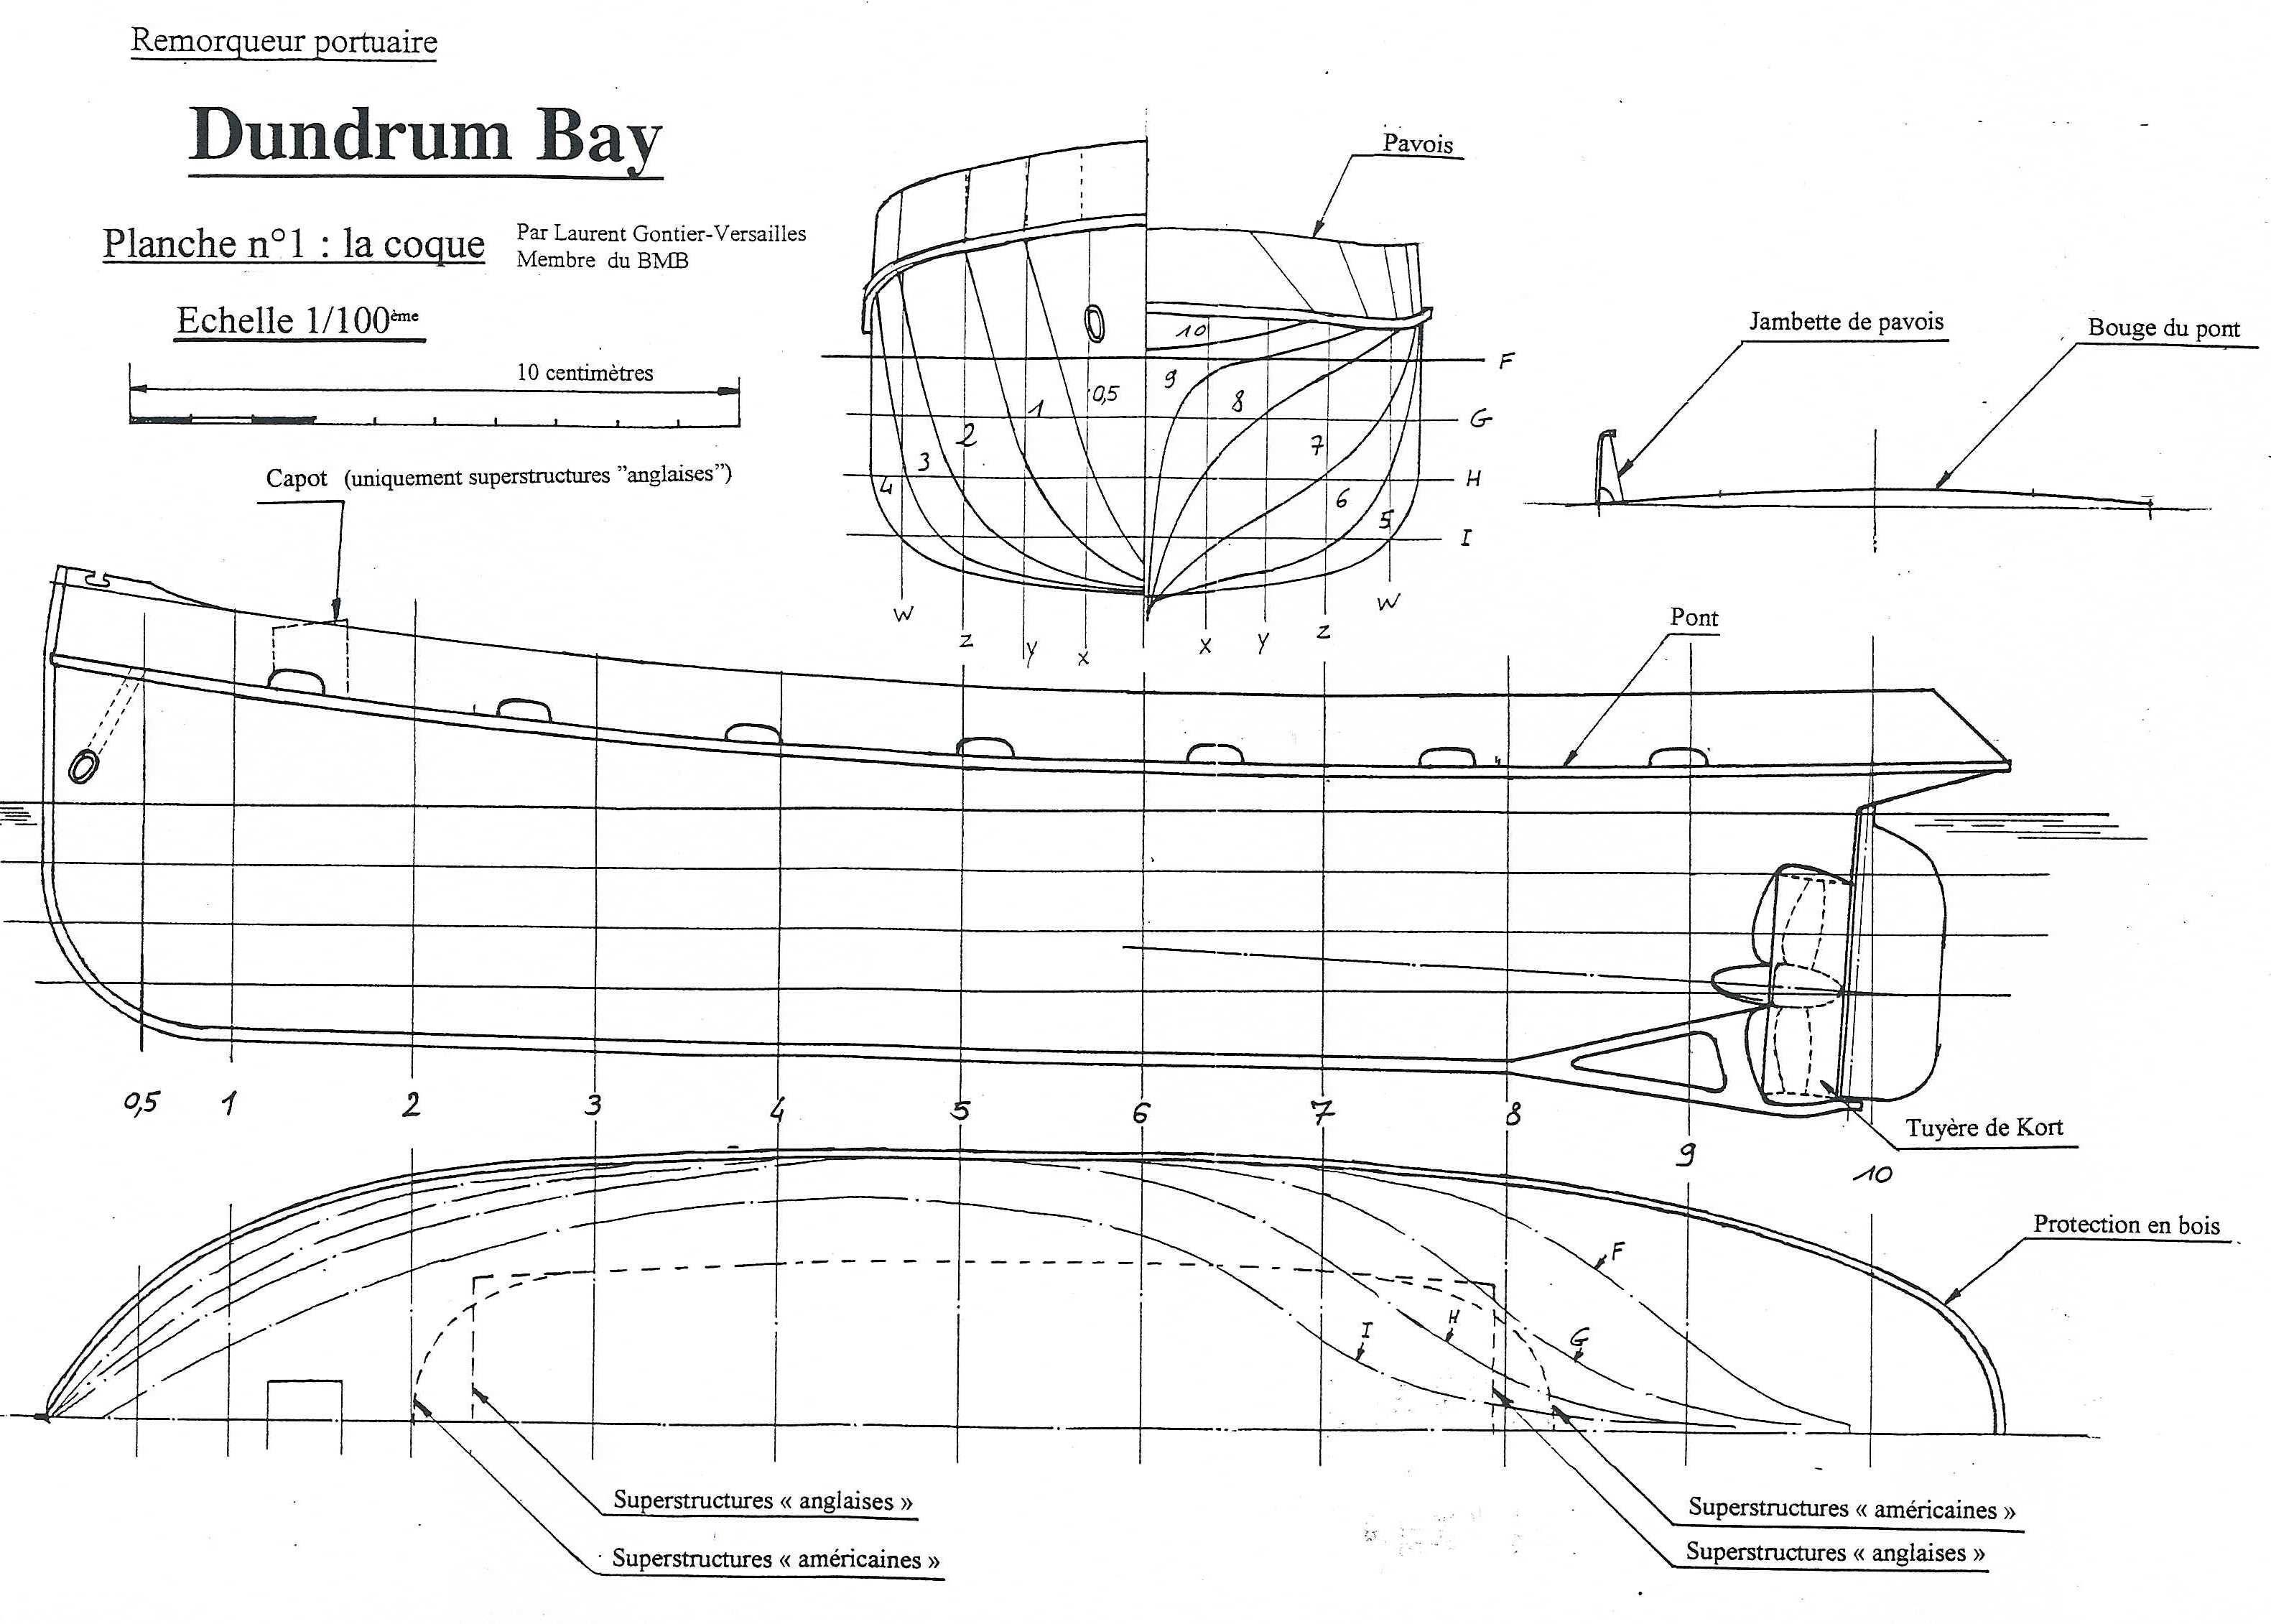 Century Boat Schematics Diy Wiring Diagrams Marine Schematic Free Blueprints Mini Tugboat Plans Joy Studio Design Rh Pinterest Com Audio For Boats